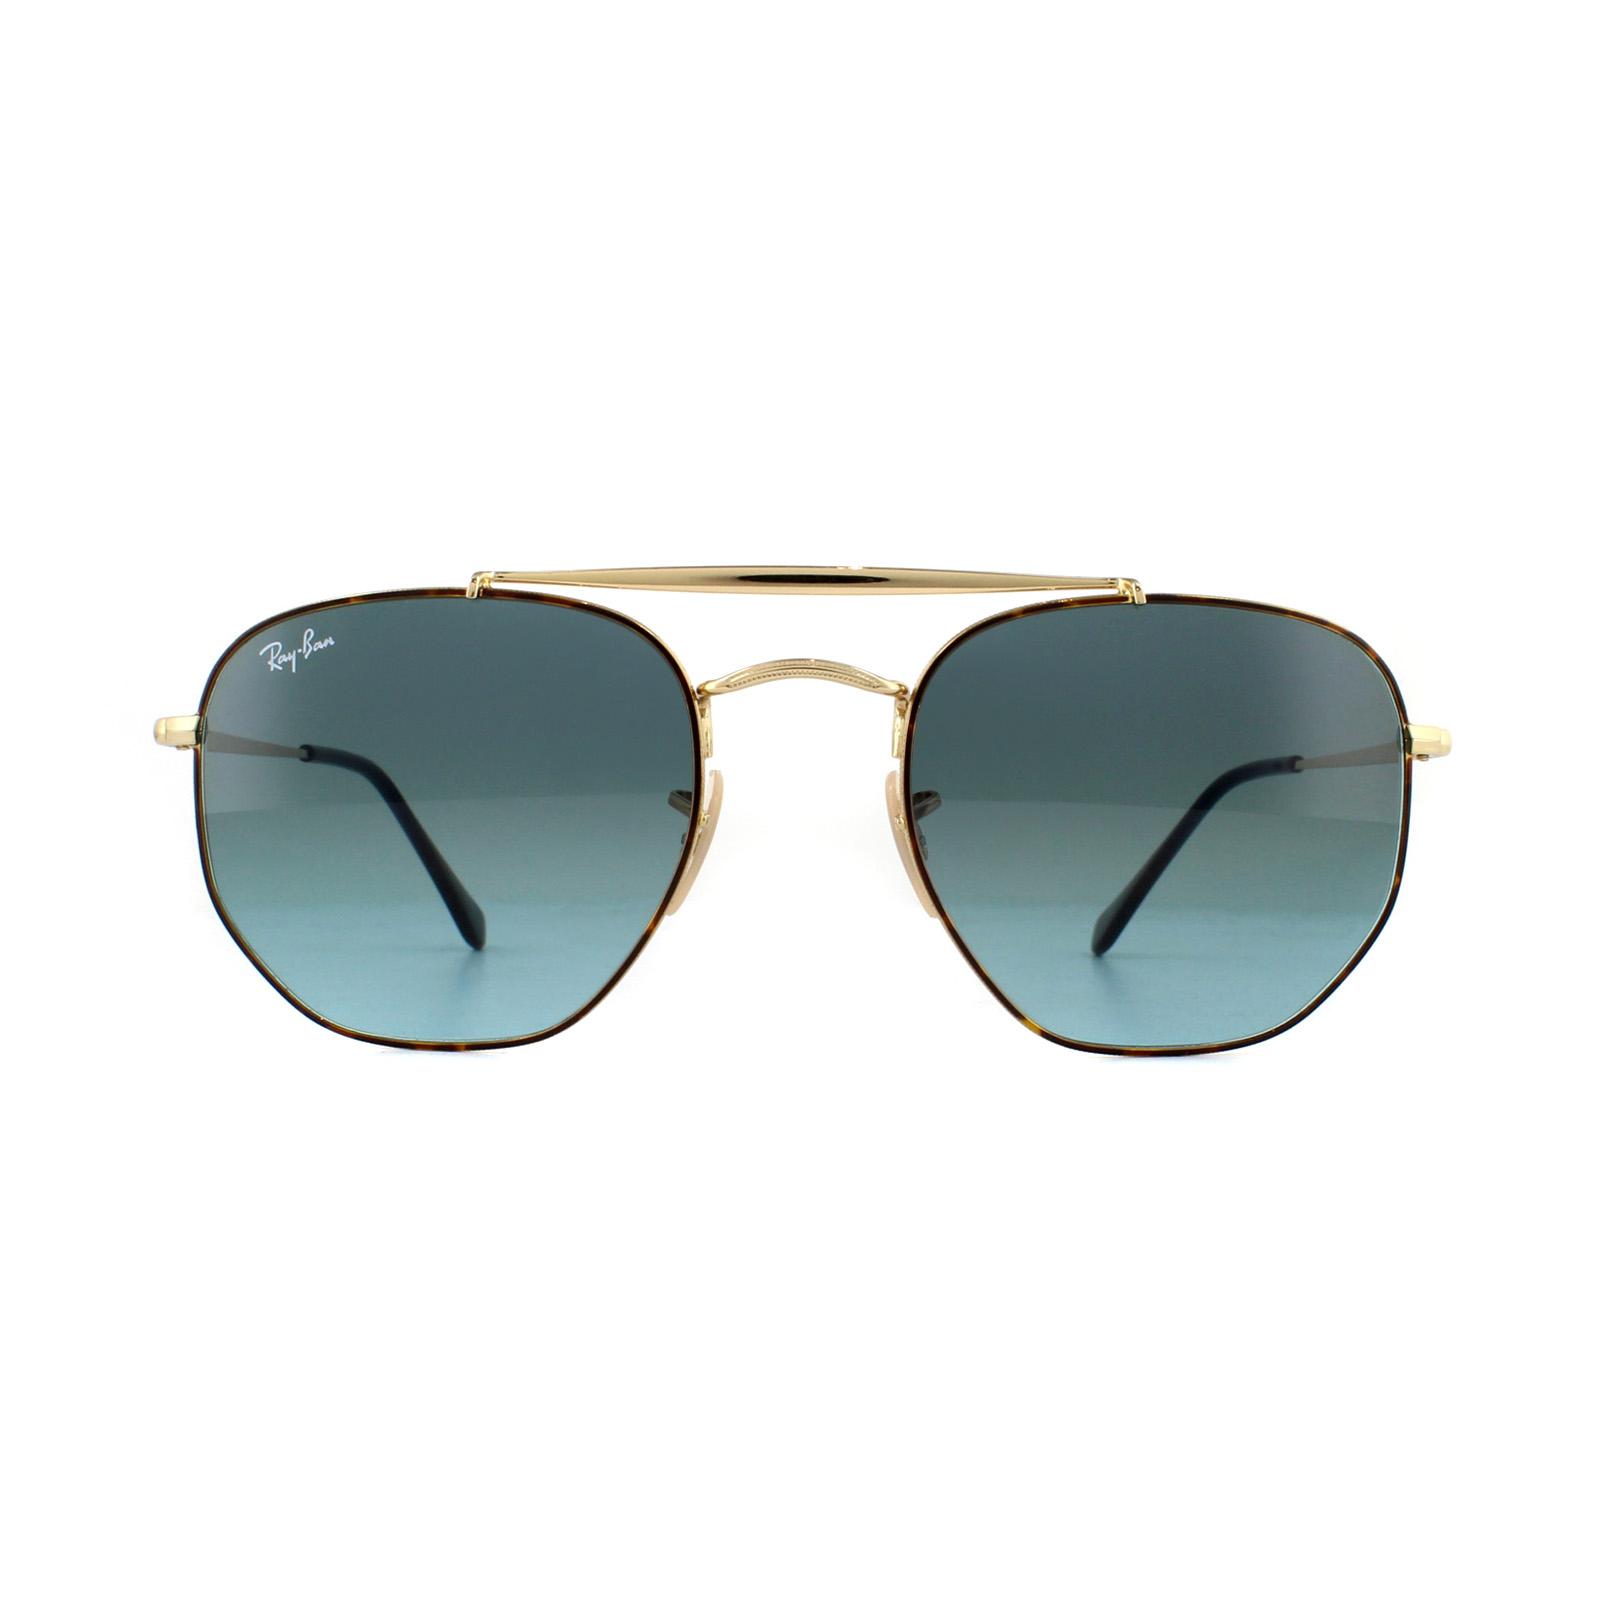 c099a34d393d6 SENTINEL Occhiali da sole Ray-Ban Marshal 3648 91023M tartaruga oro blu  sfumato